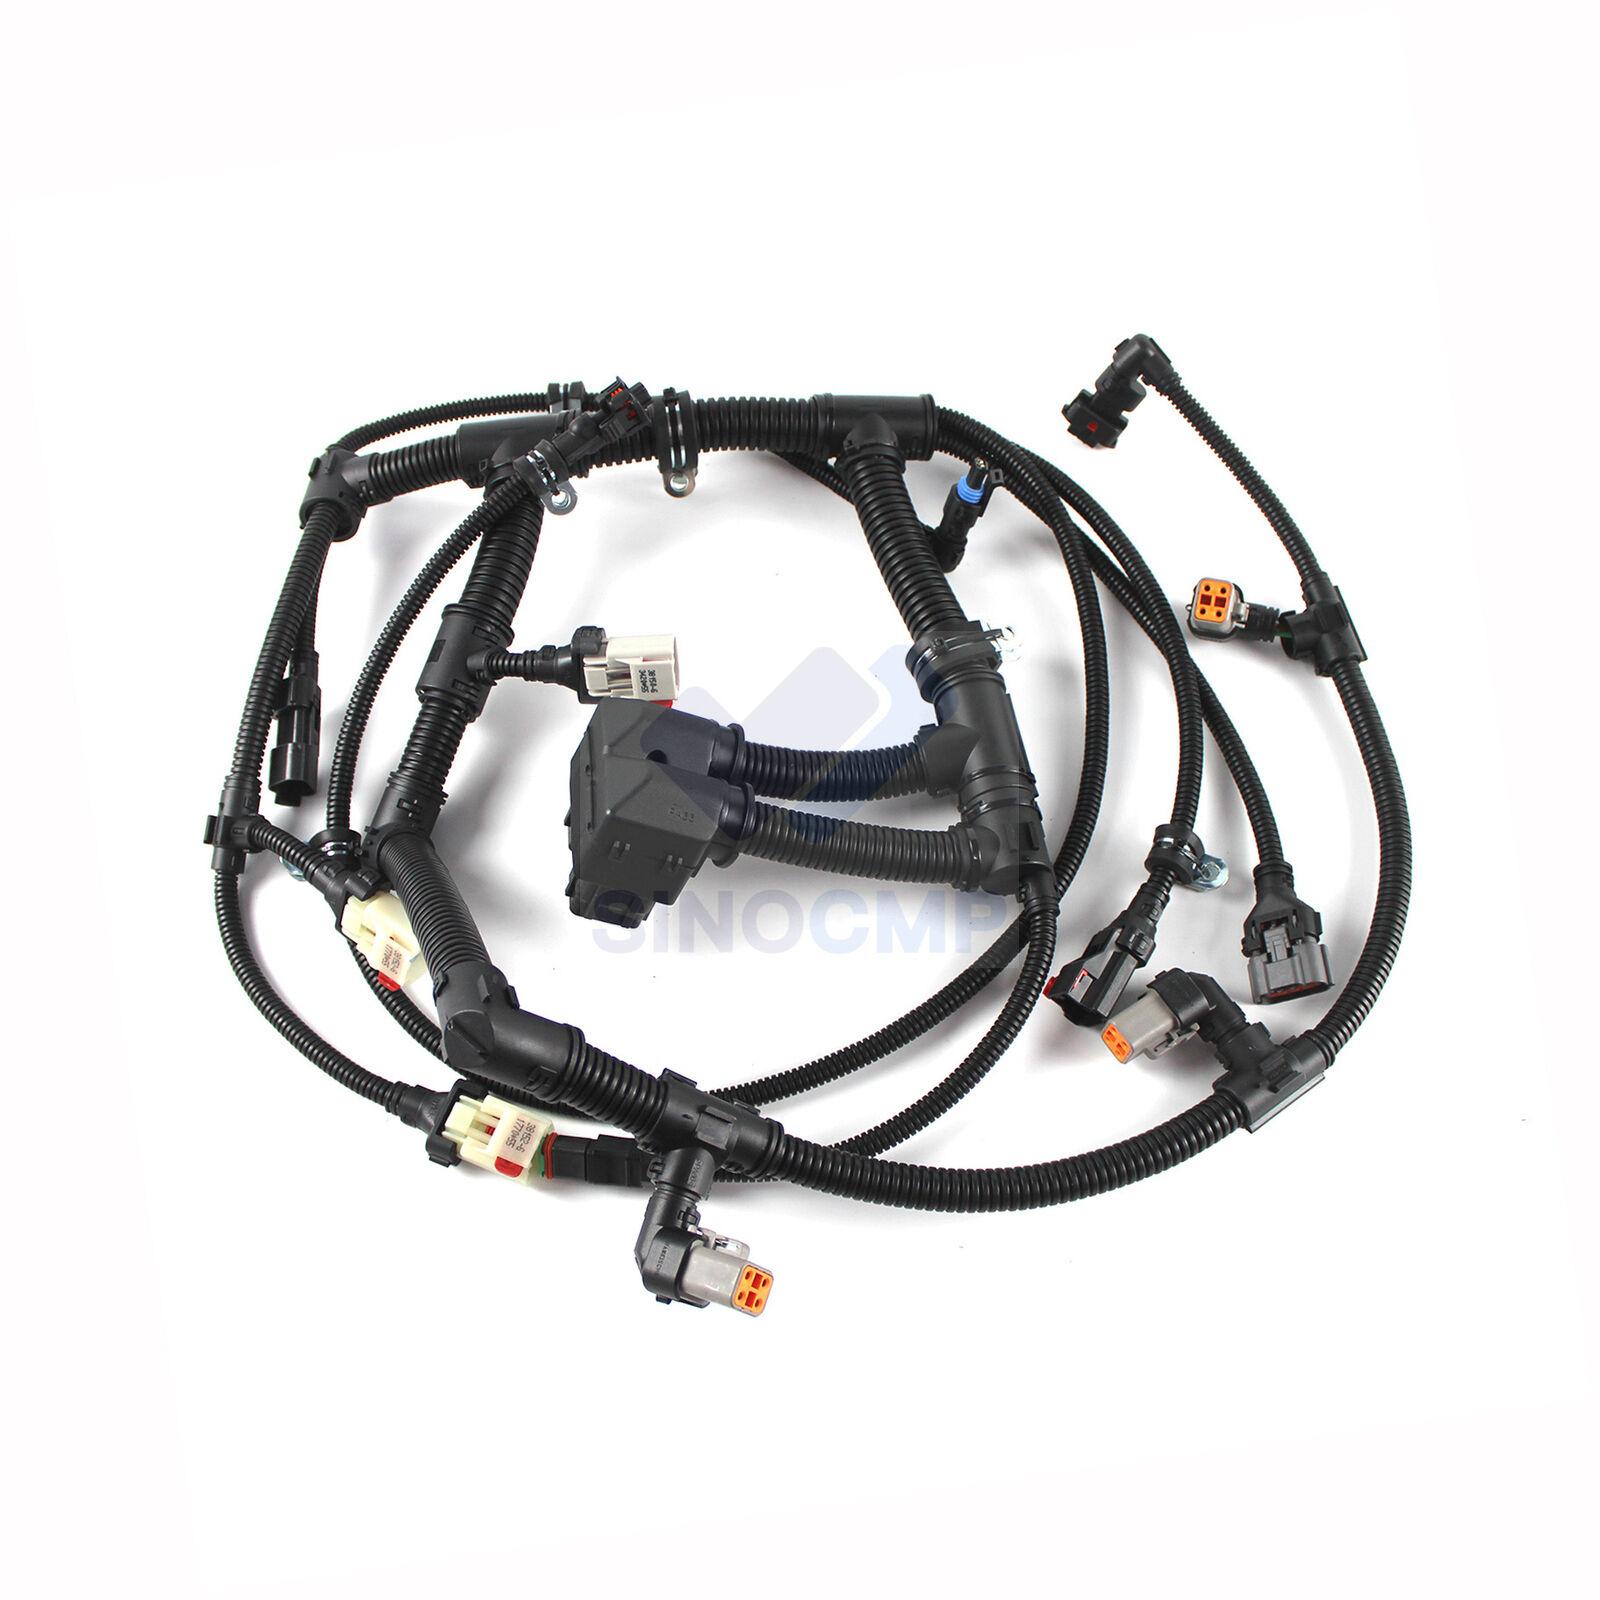 6754-81-9310 Engine Wiring Harness For Komatsu Excavator